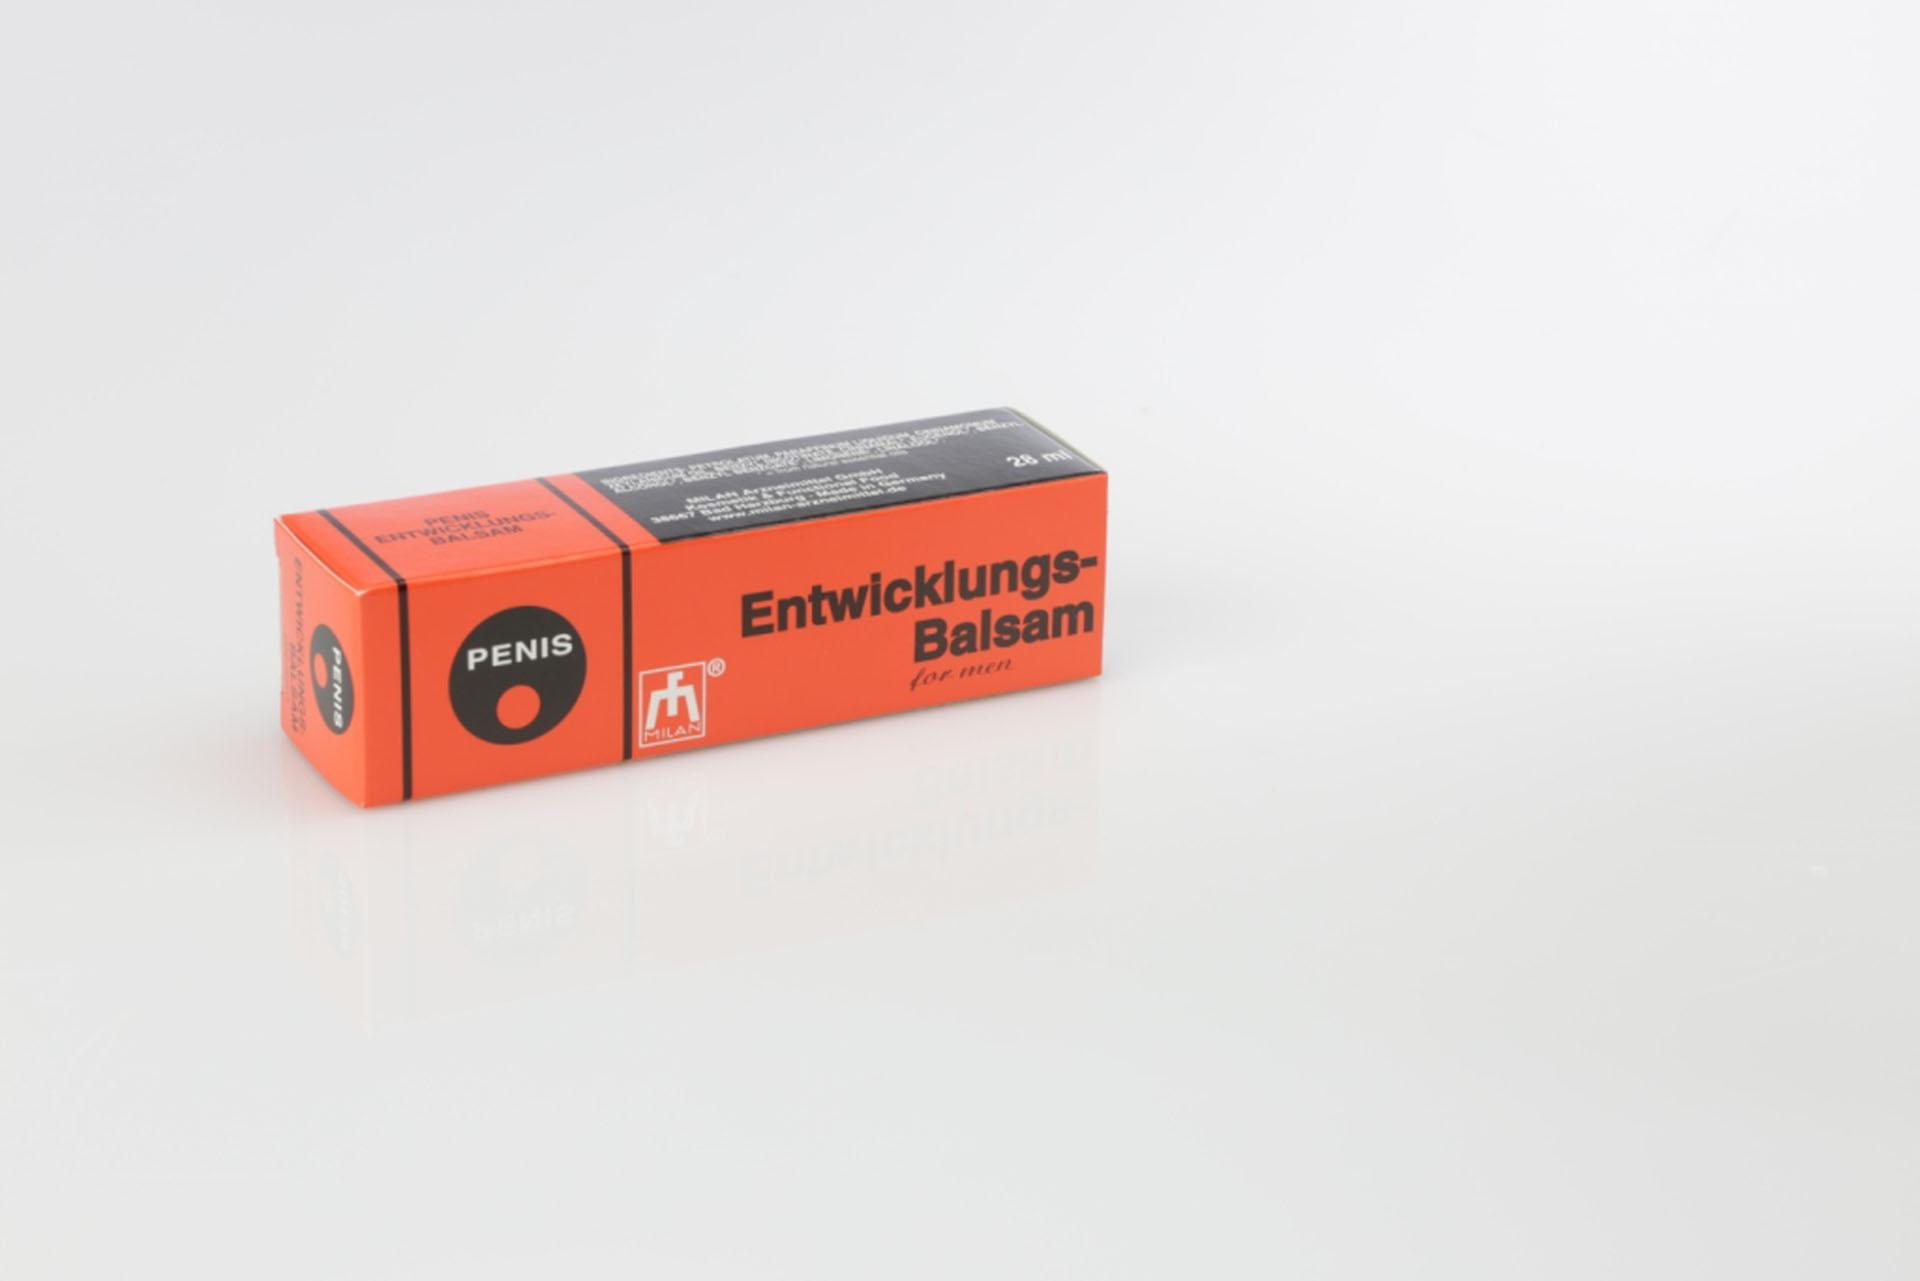 24 - Penis-Entwicklungs-Balsam